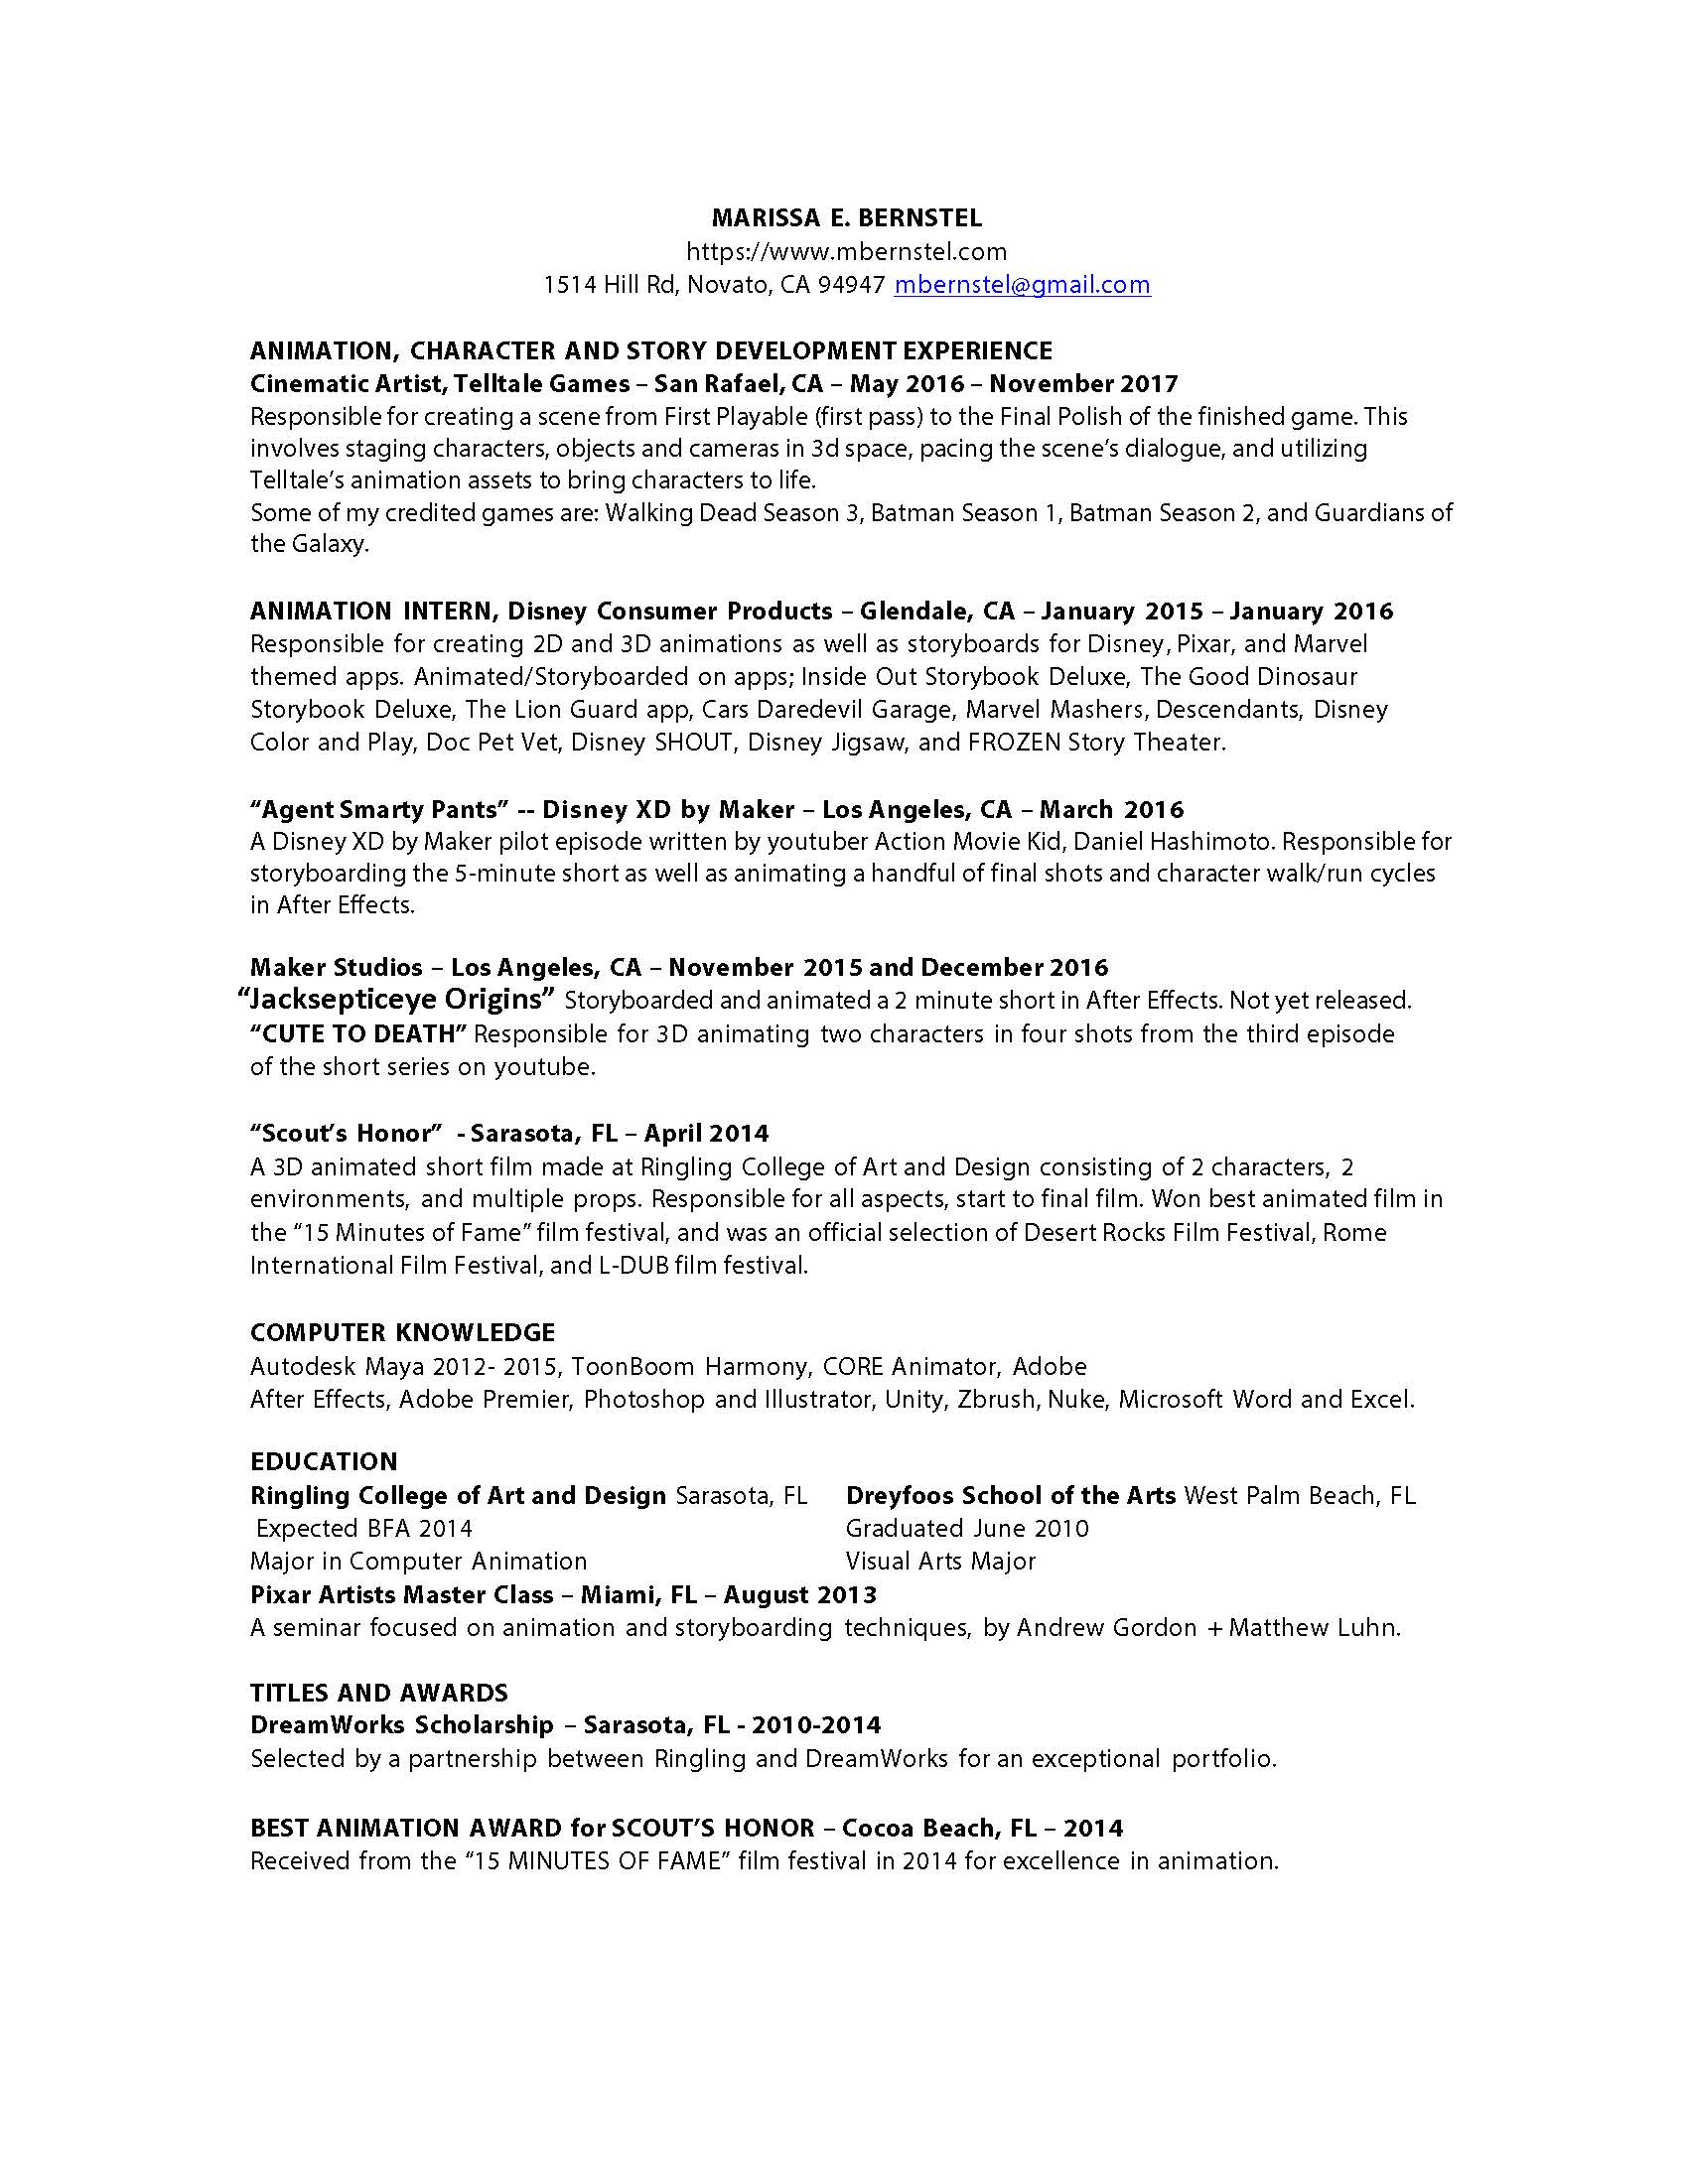 Marissa Bernstel S Resume